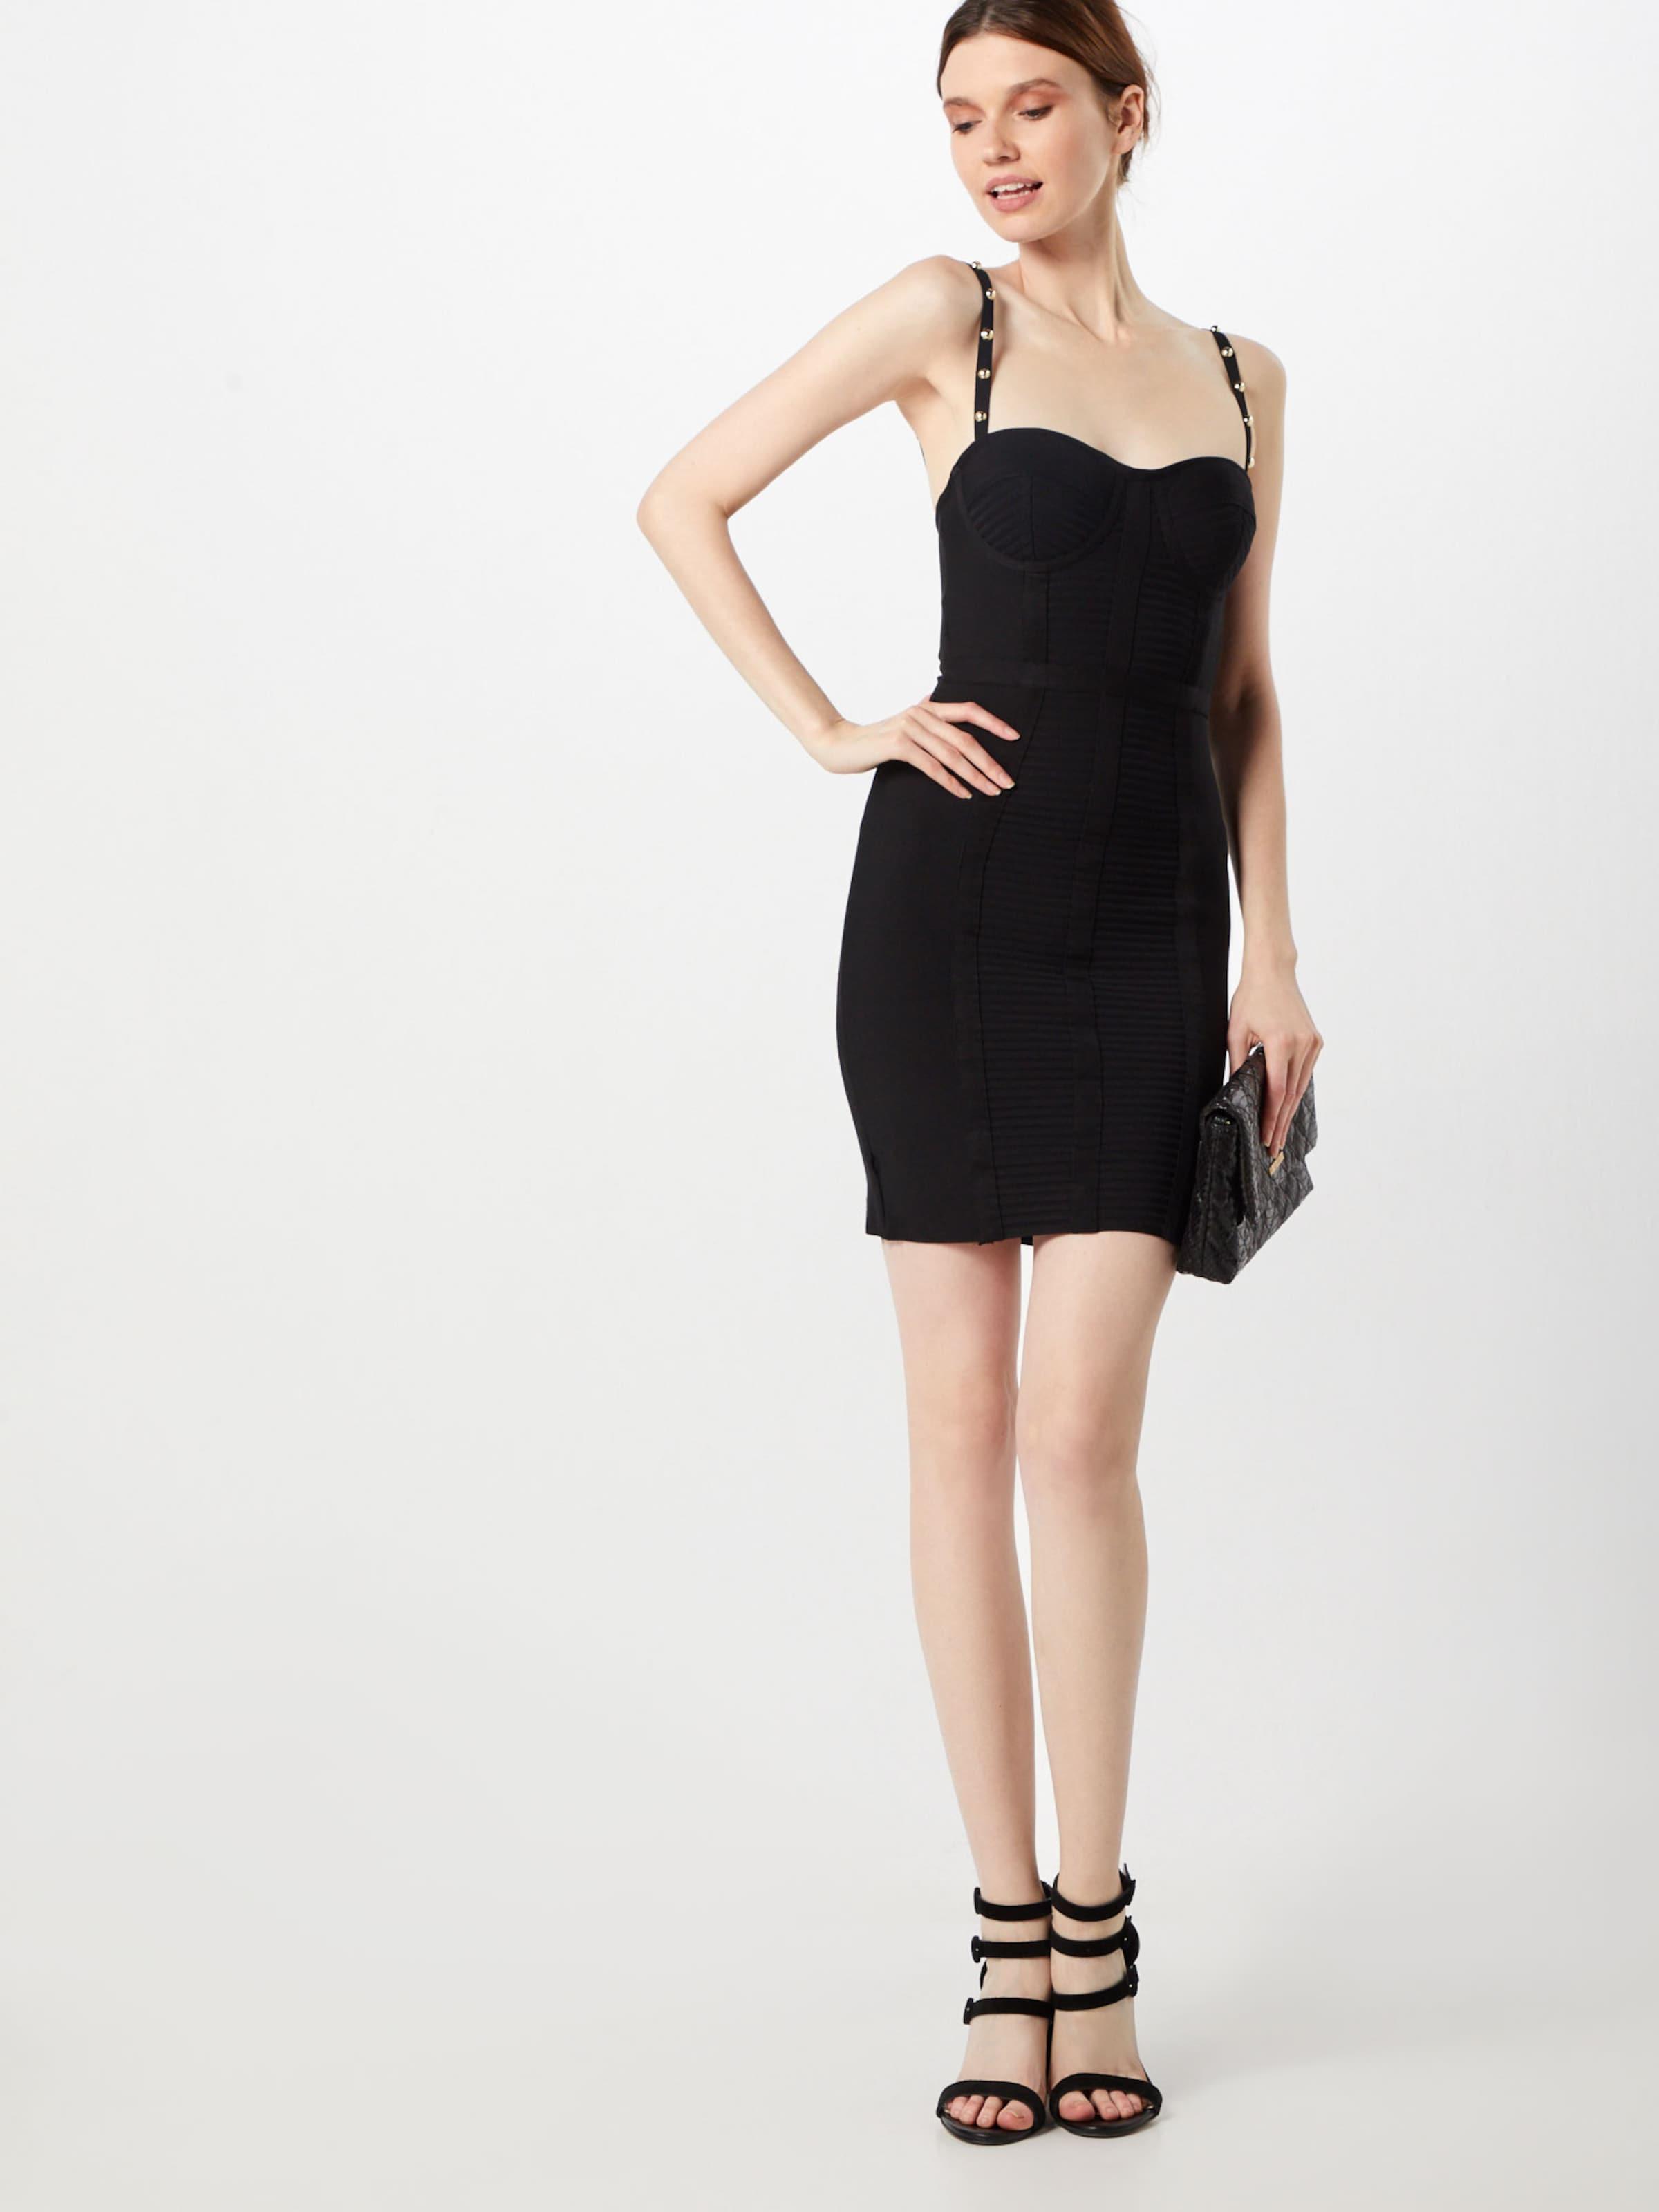 Kleid Schwarz Guess 'anne' In Wx0pk8no 8vNmnO0w